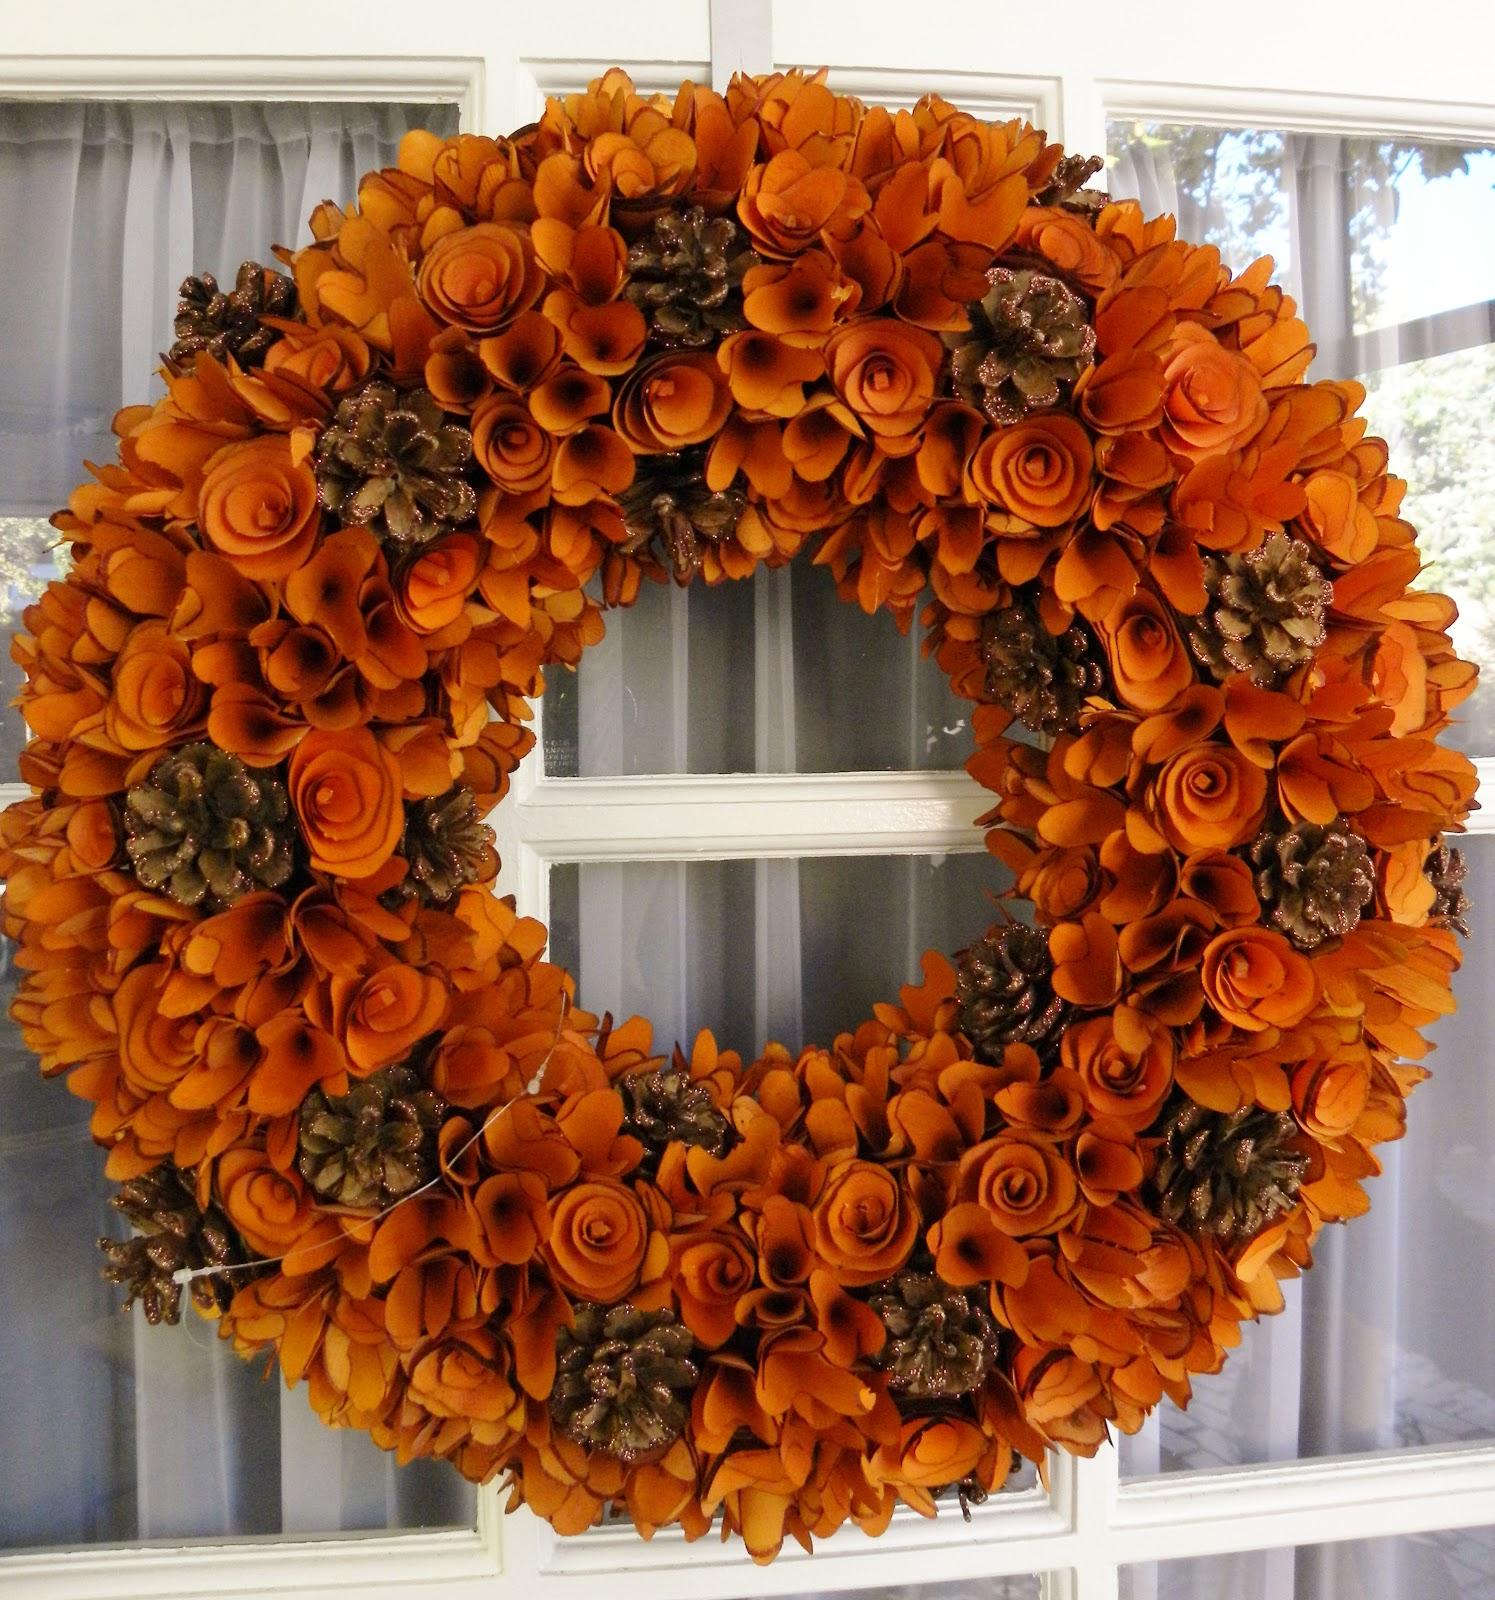 Helen Olivia Flowers Fall Wreaths